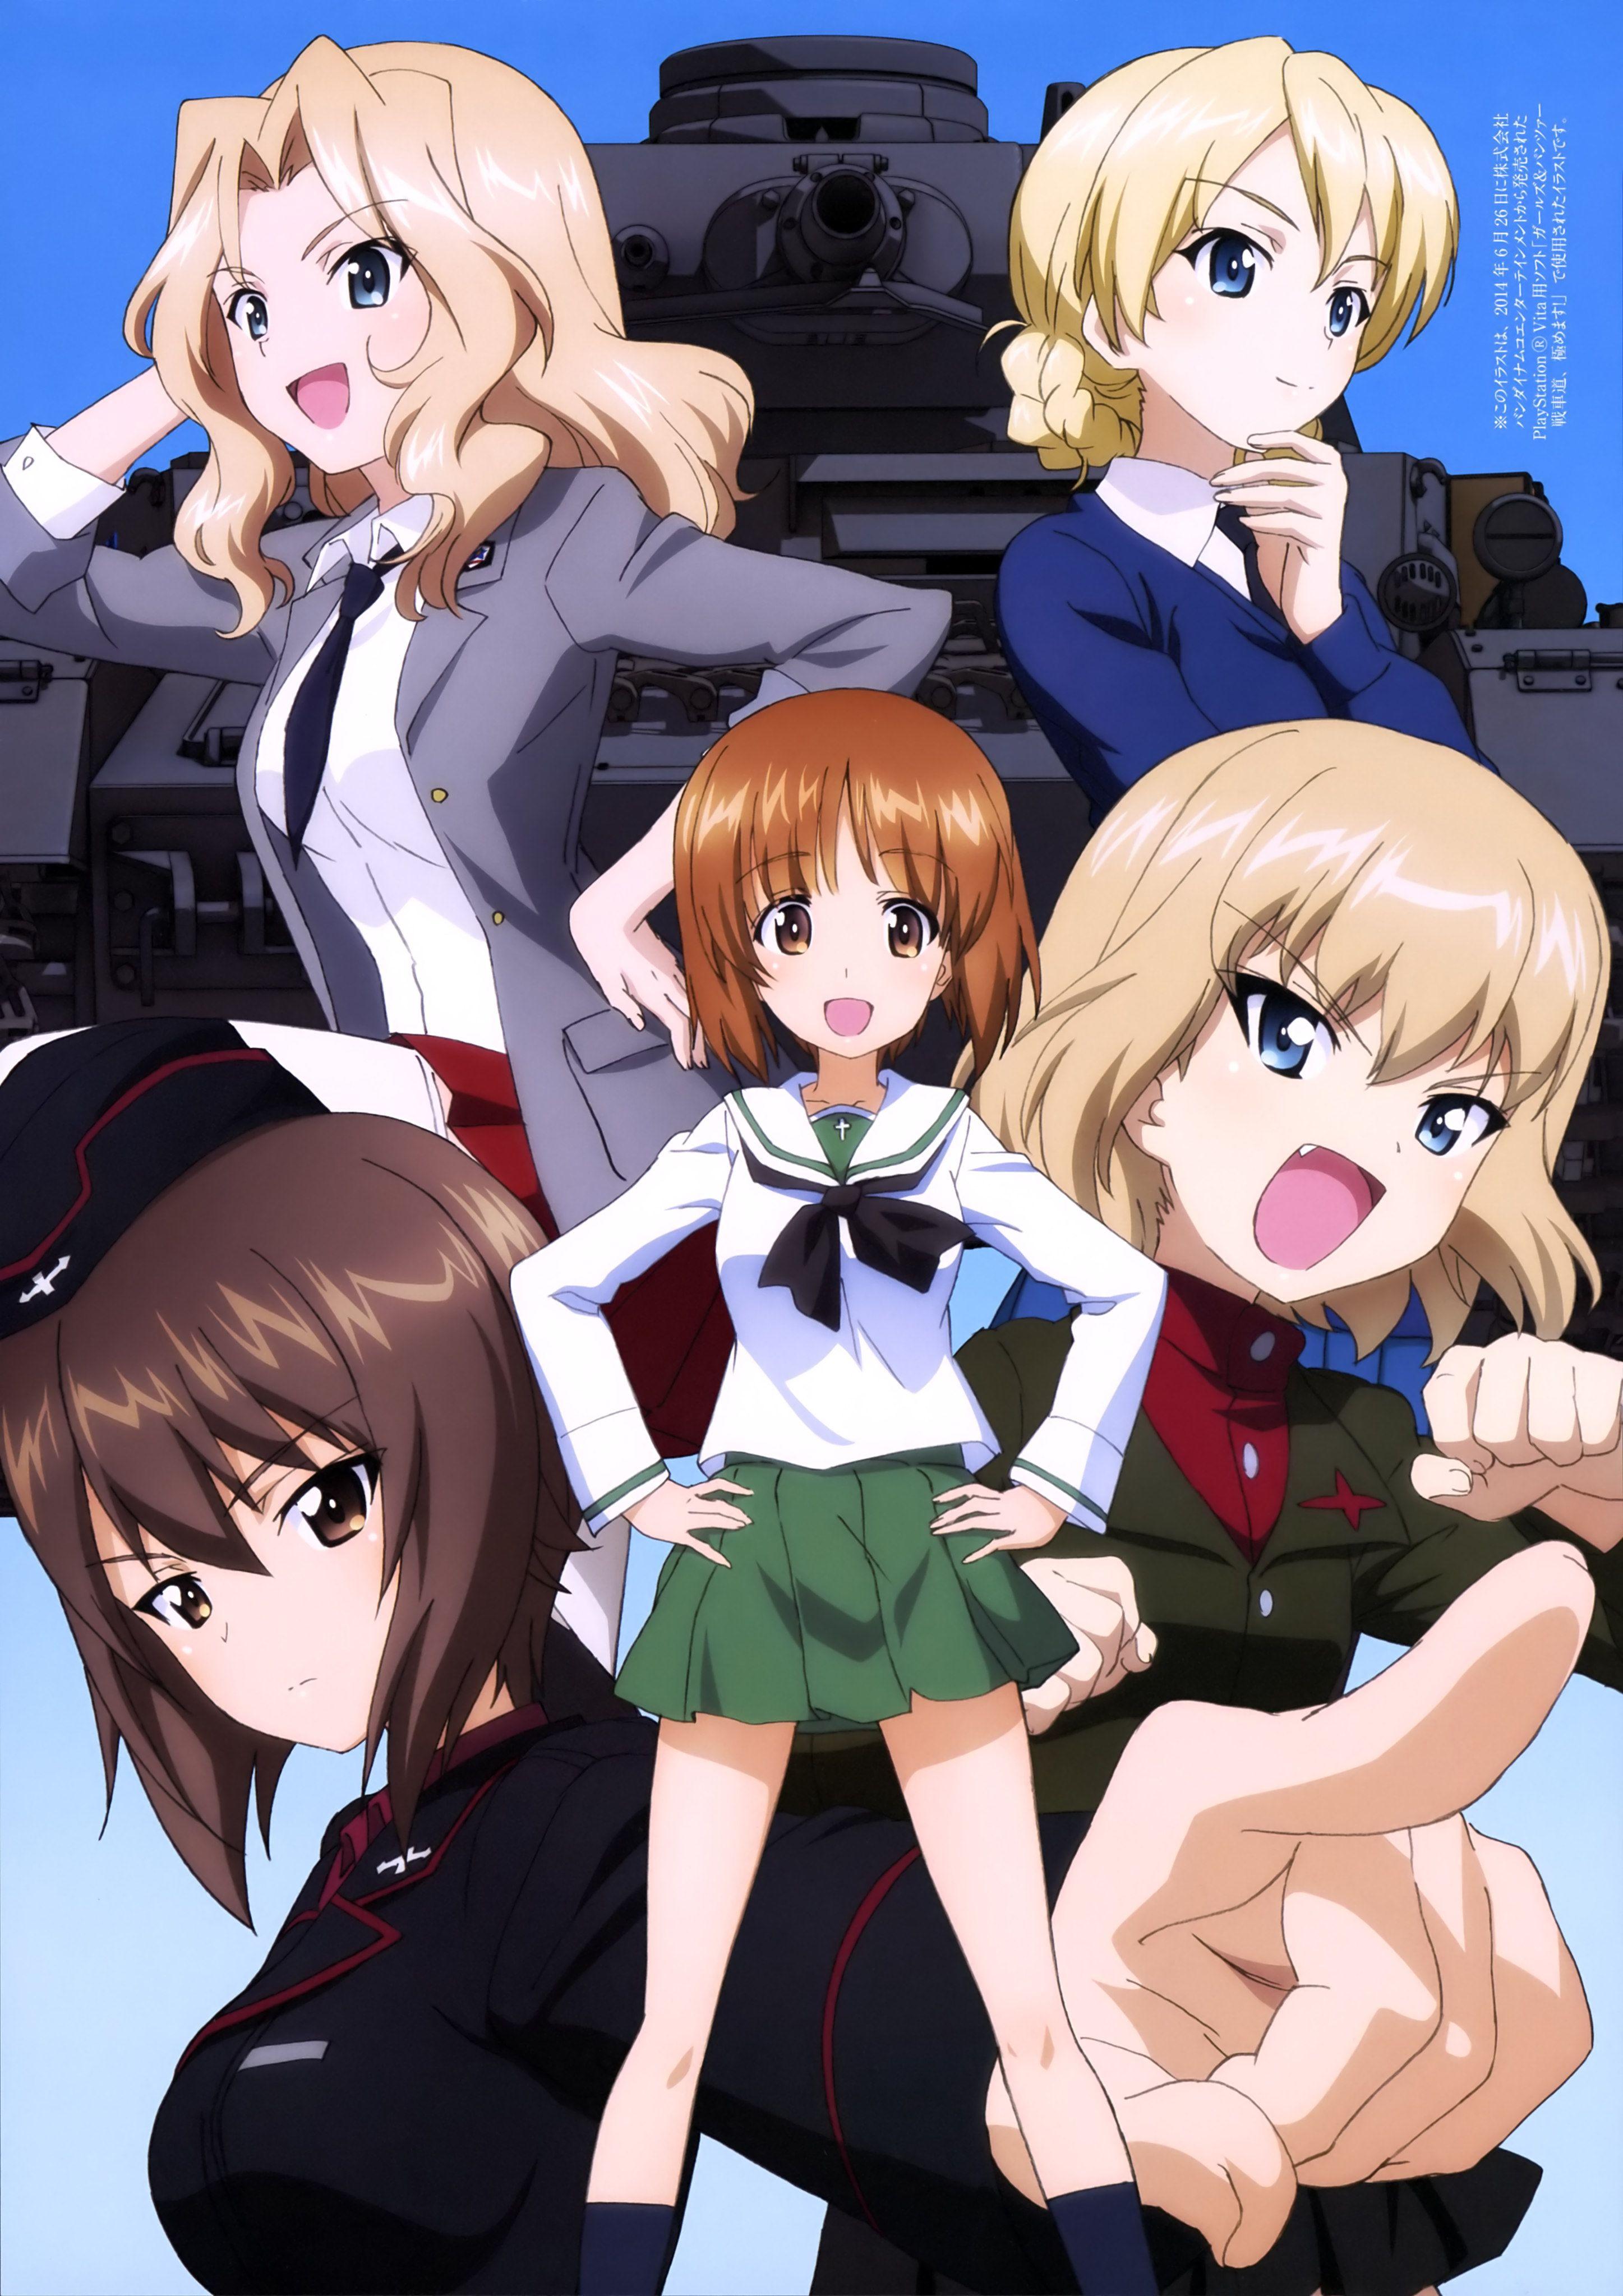 Pin On My Favorite Anime Girls Und Panzer